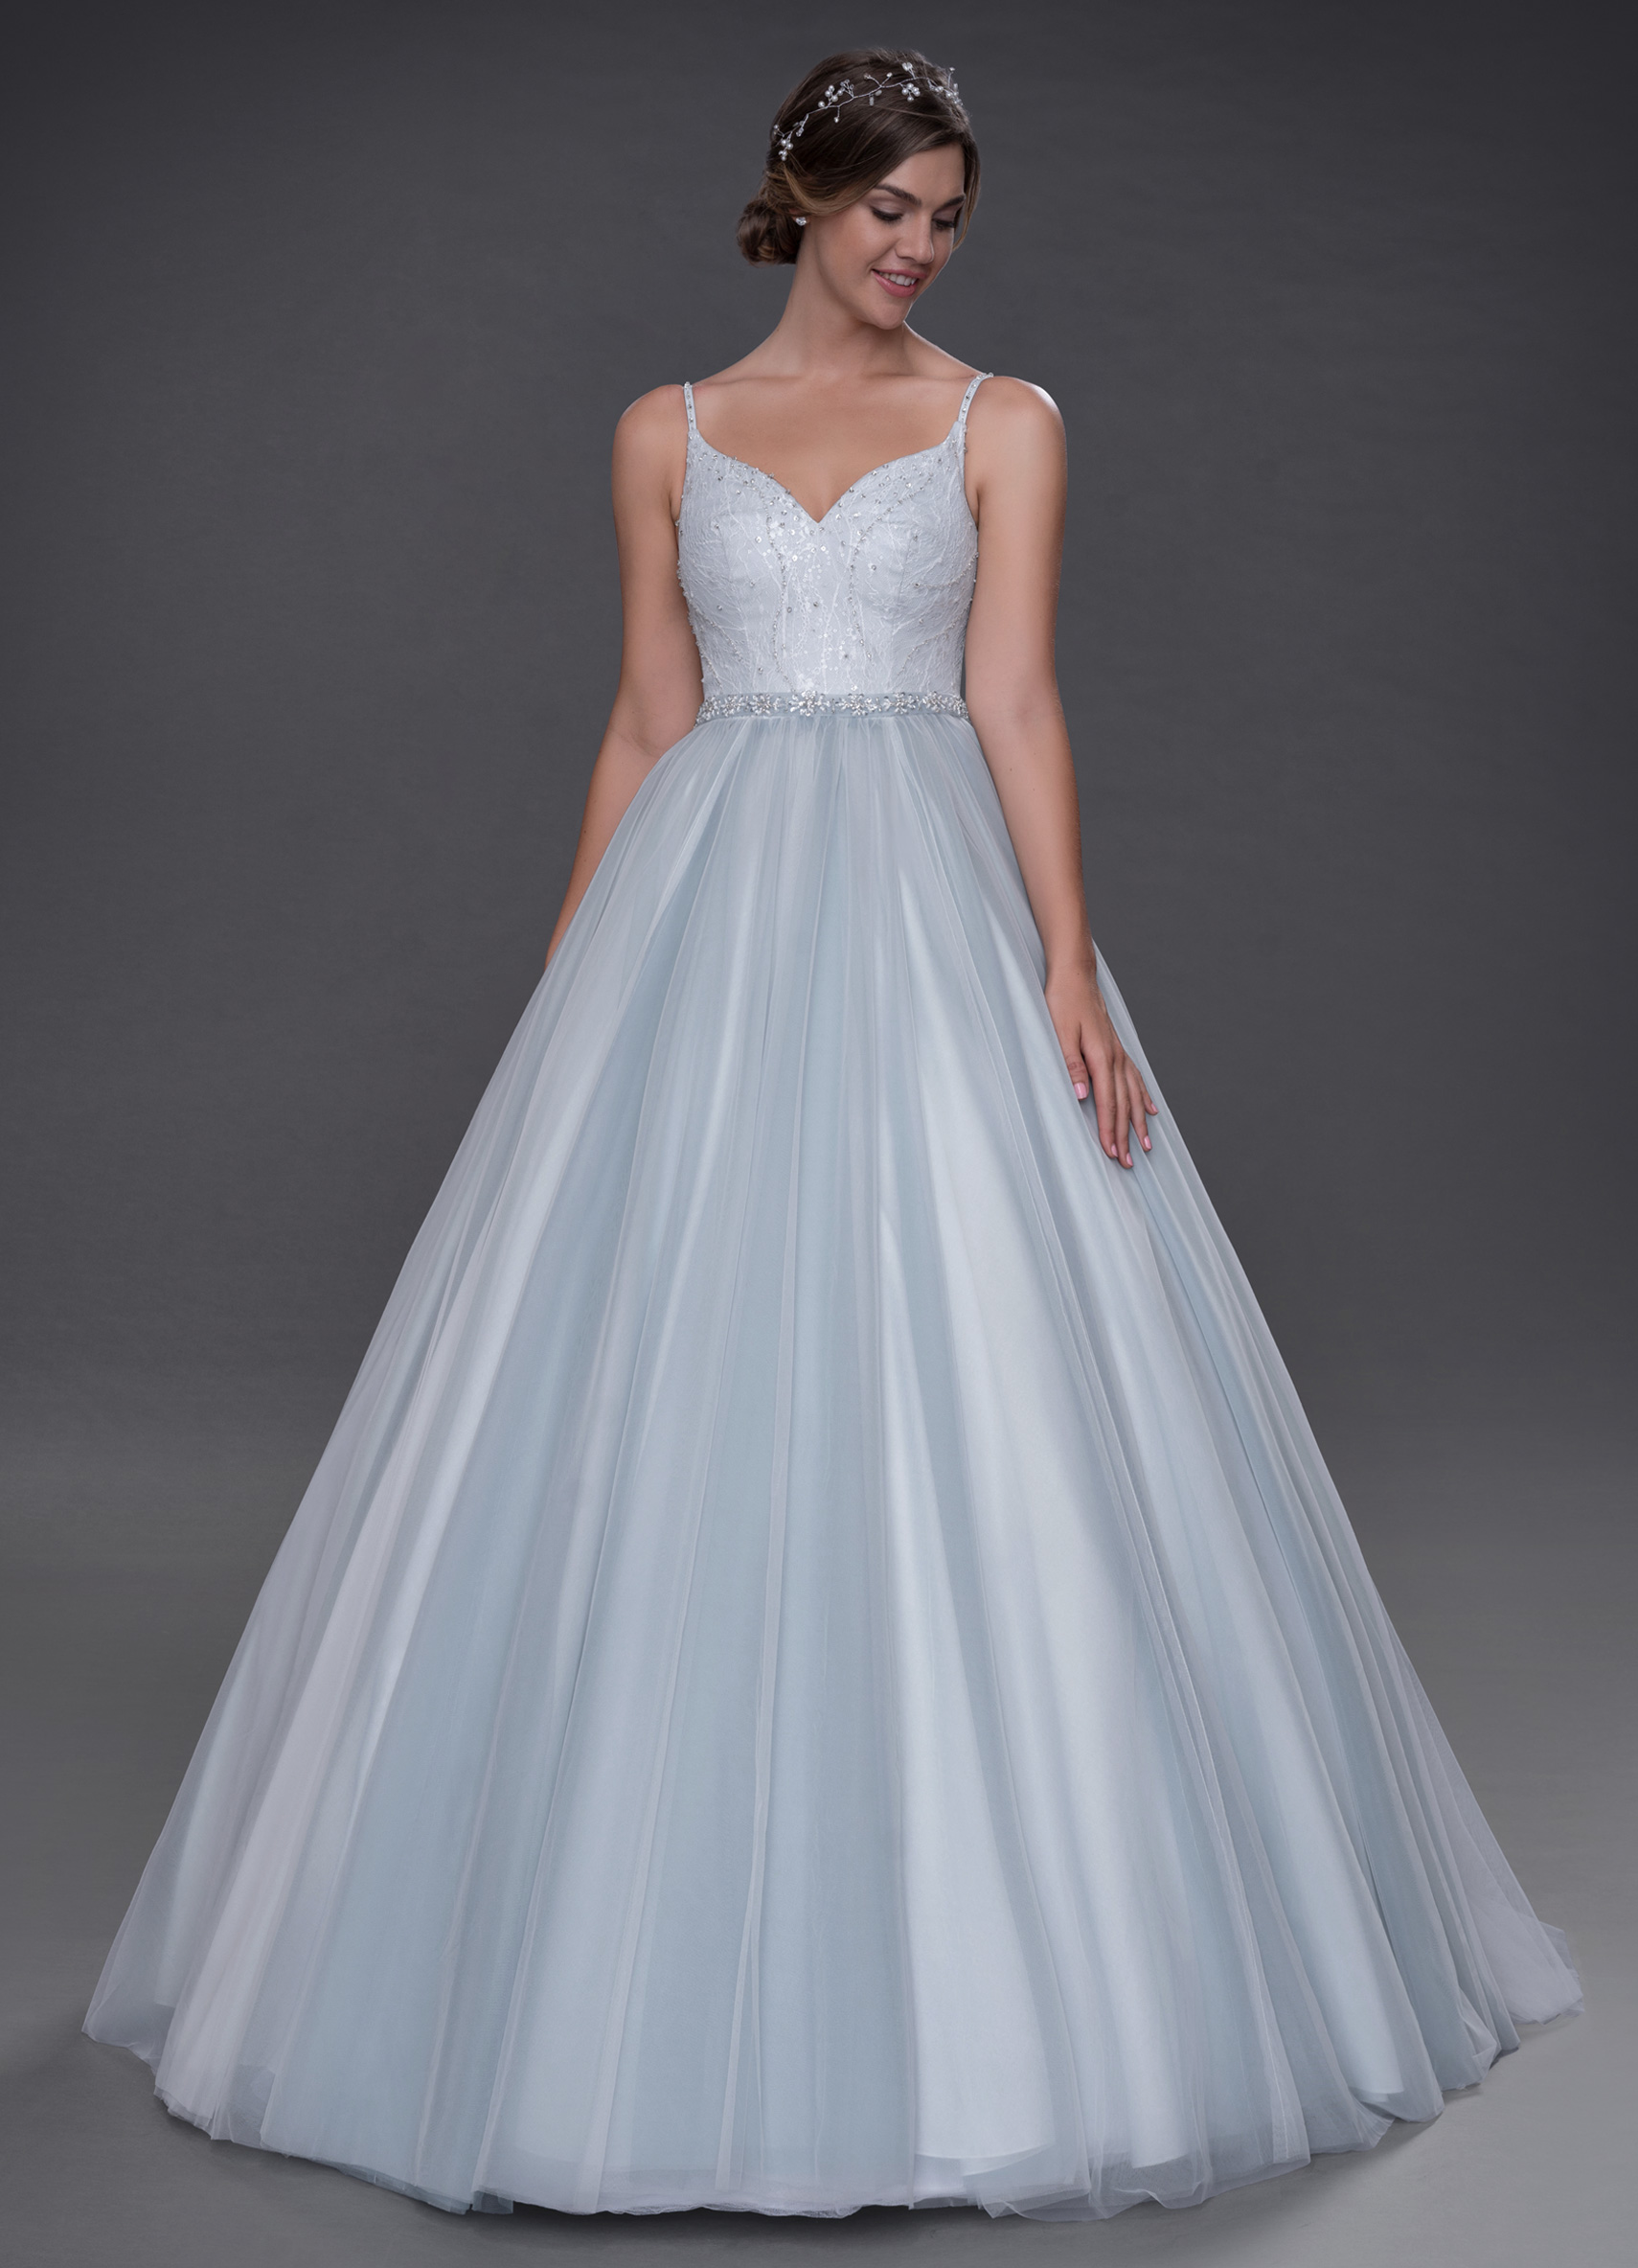 2020-wedding-dress-predictions